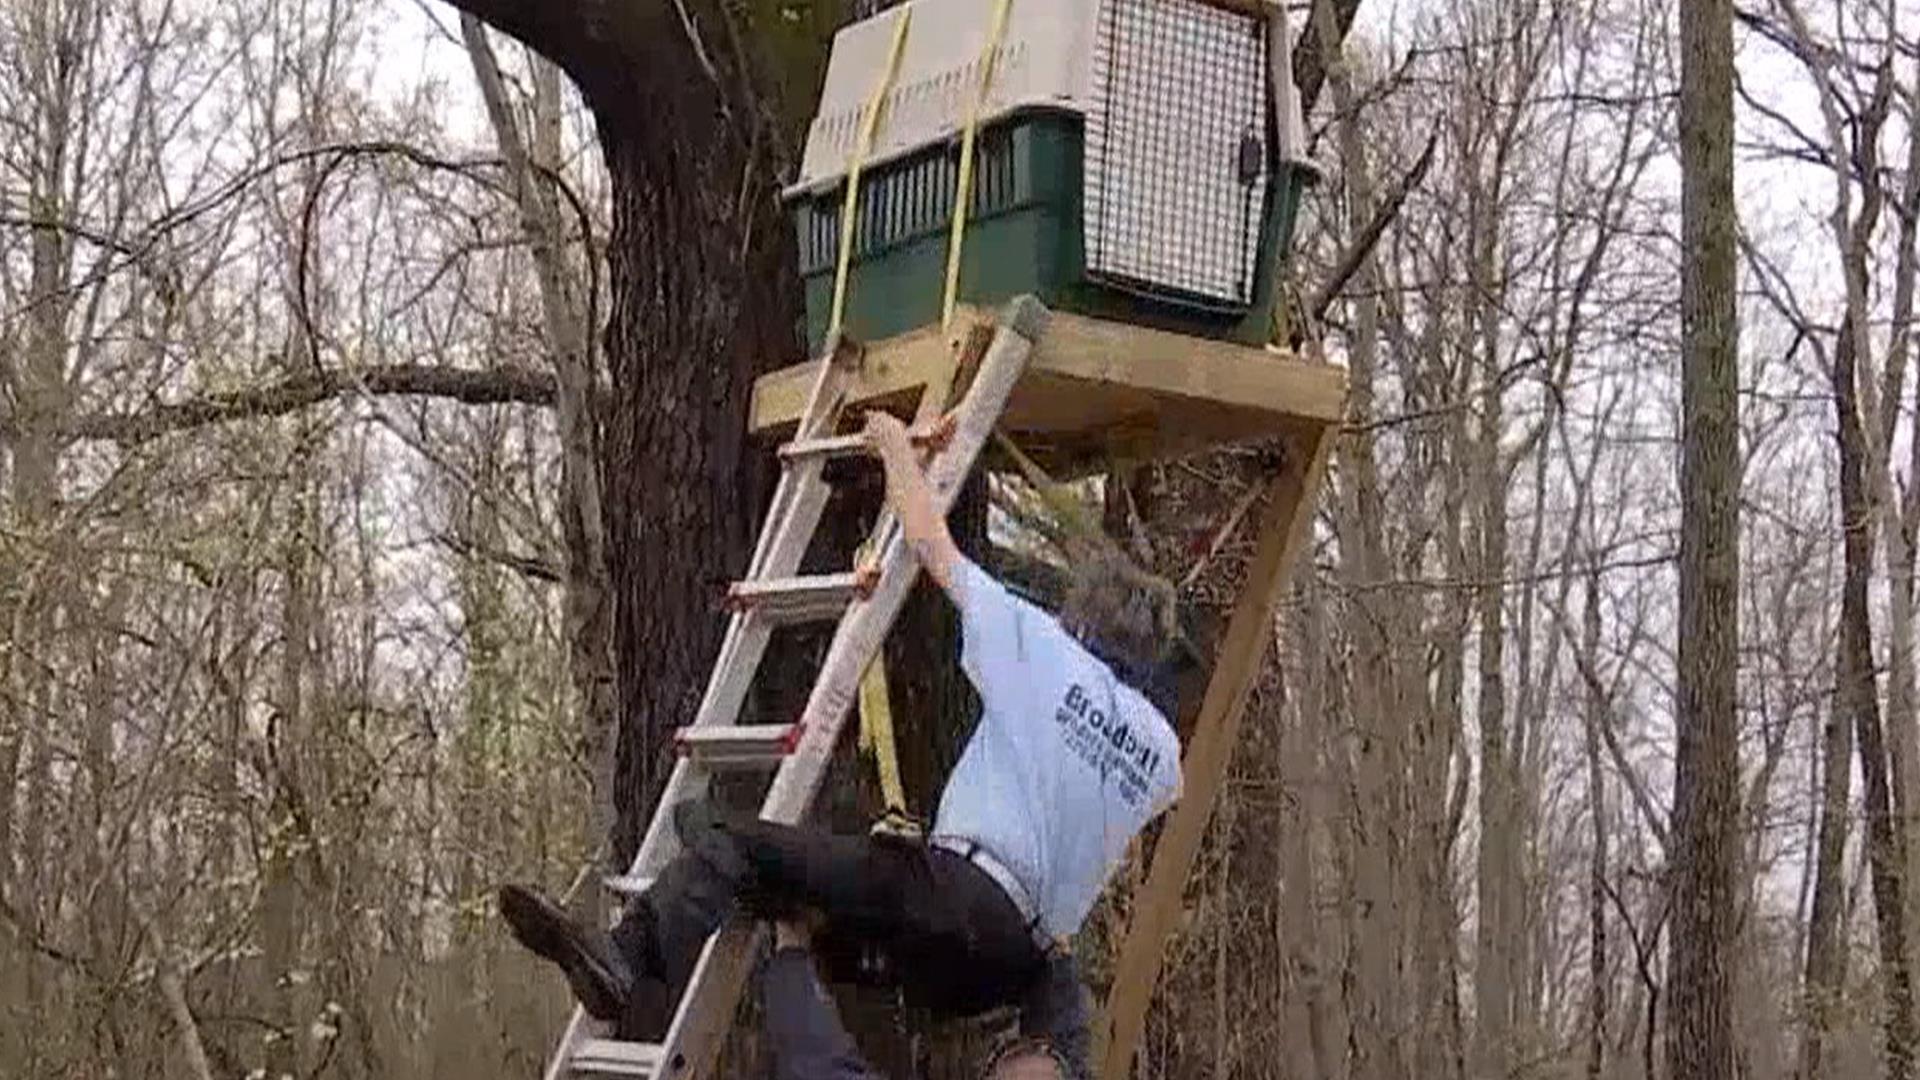 Good Catch Worker Falls Off Ladder Releasing Bald Eagle